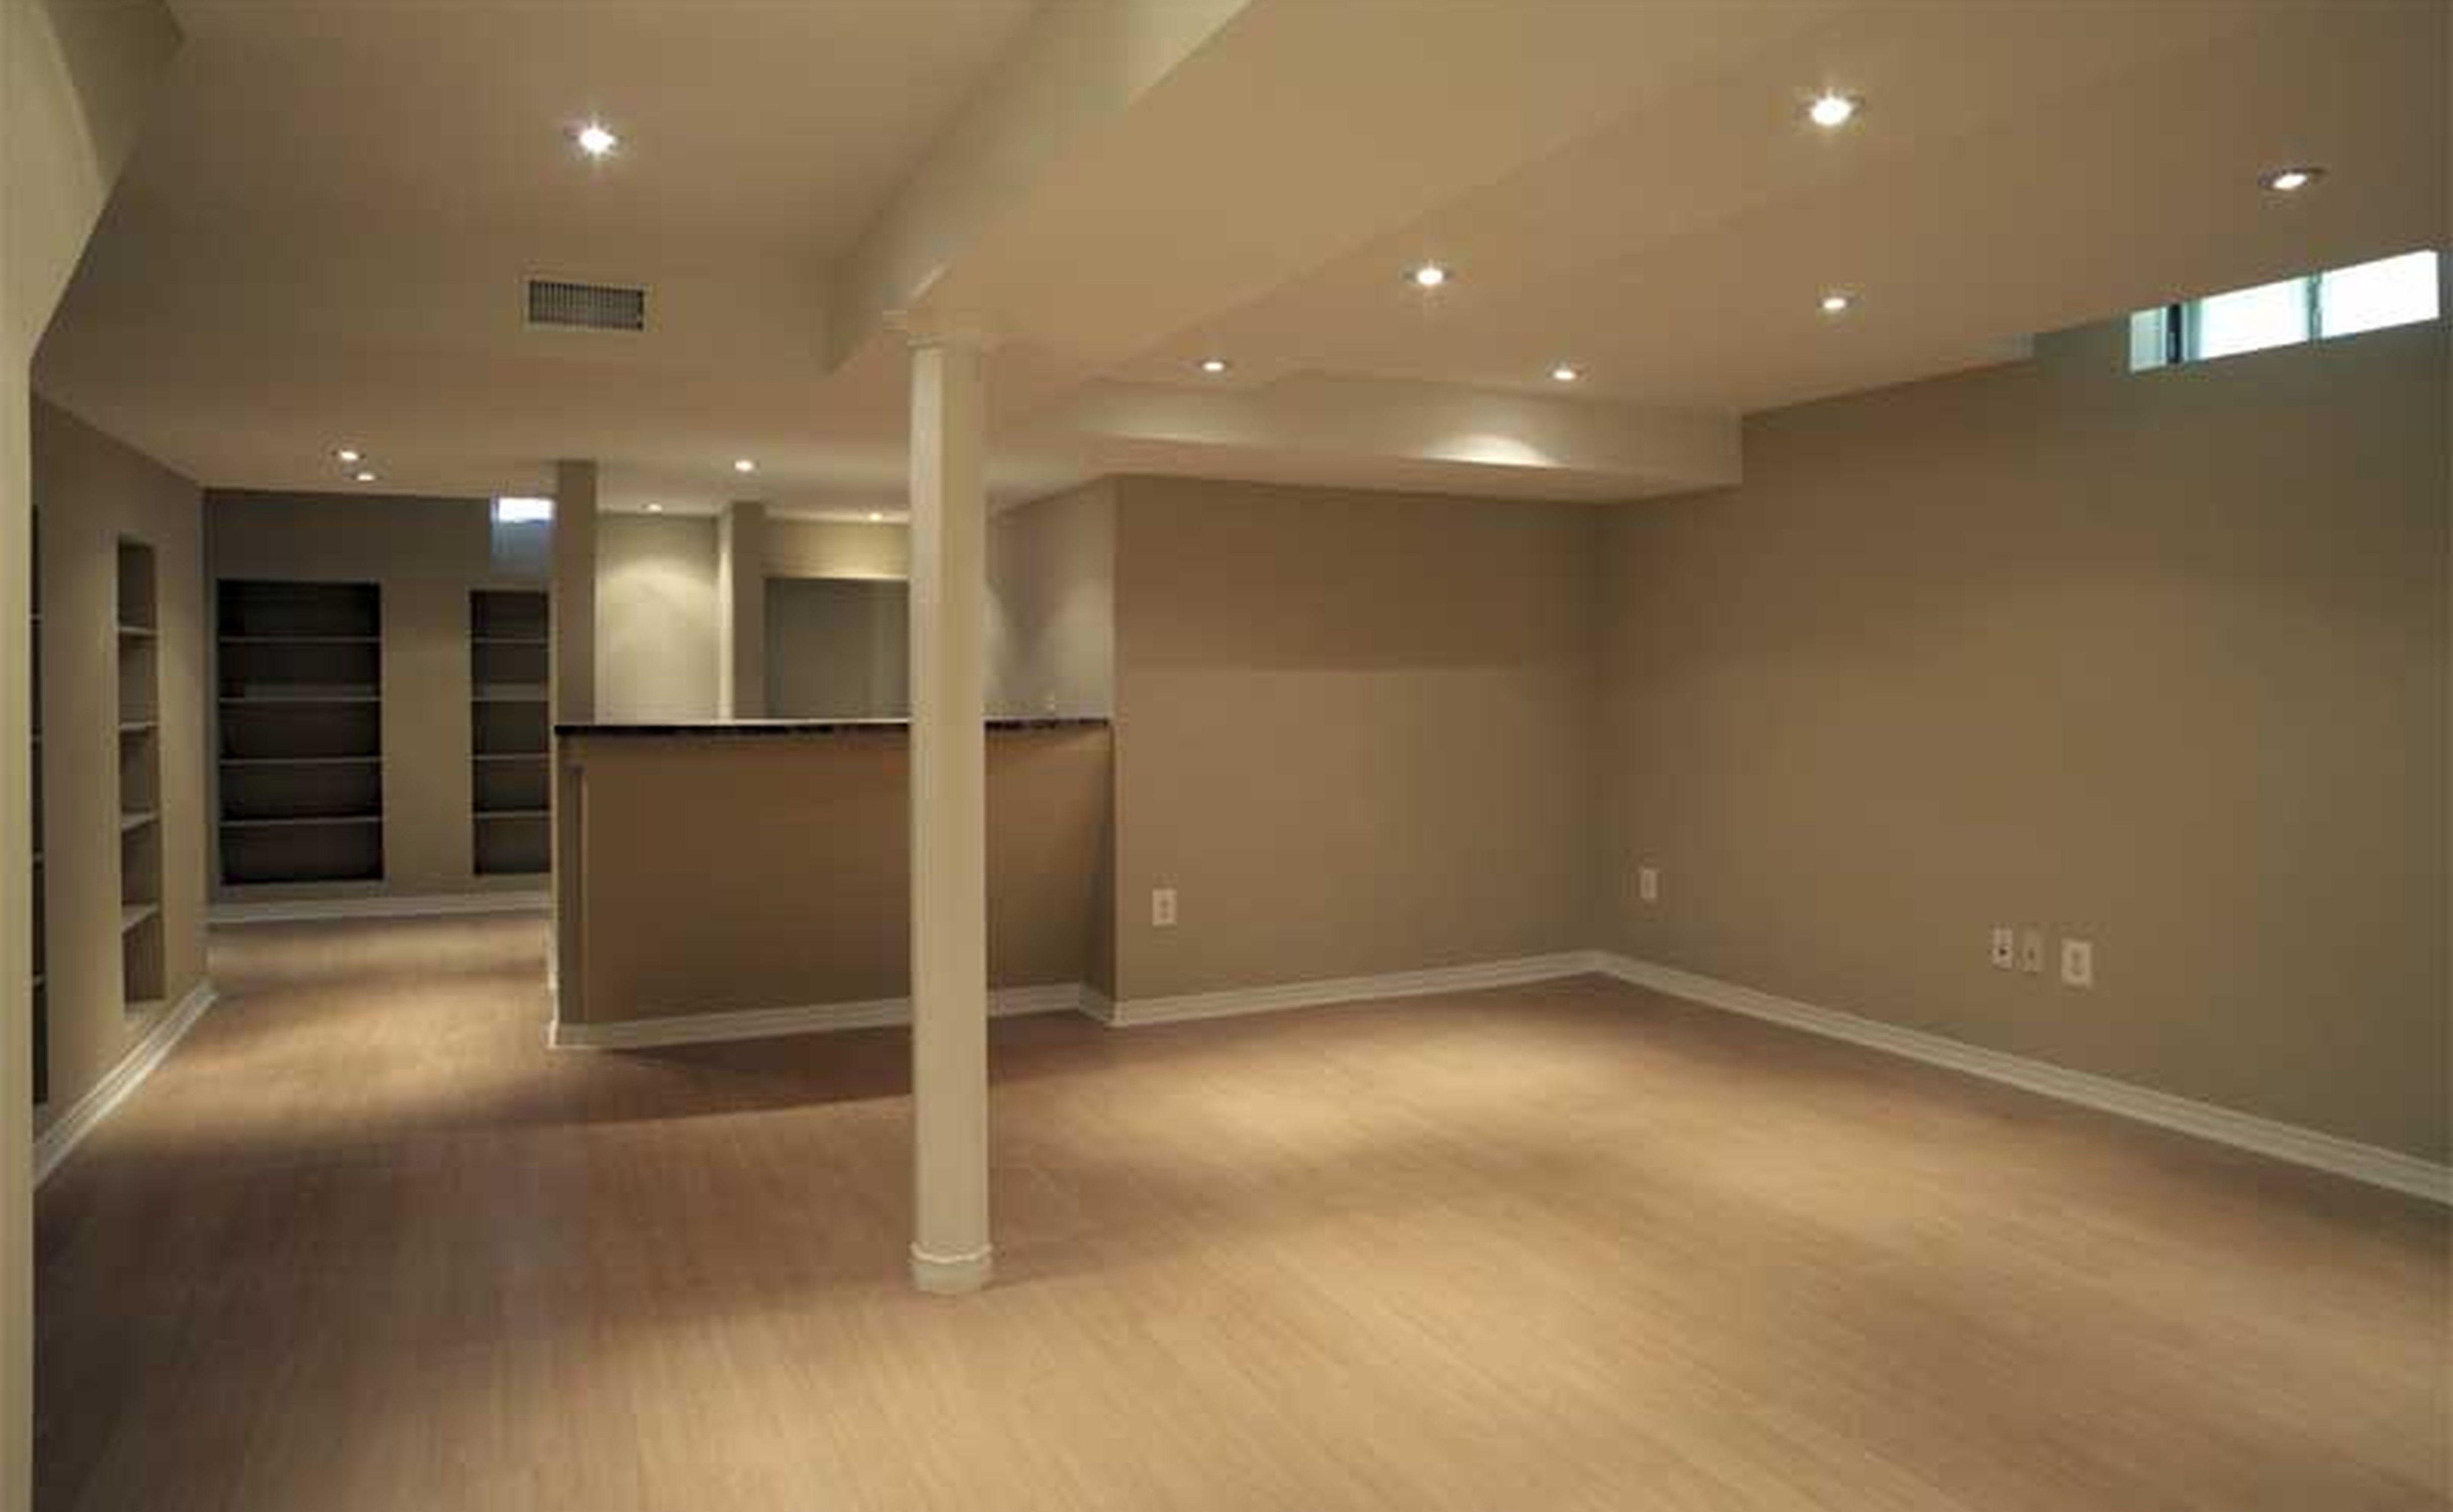 White Epoxy Paint Waterproof Basement Flooring Basement Flooring Waterproof Painting Basement Floors Best Flooring For Basement